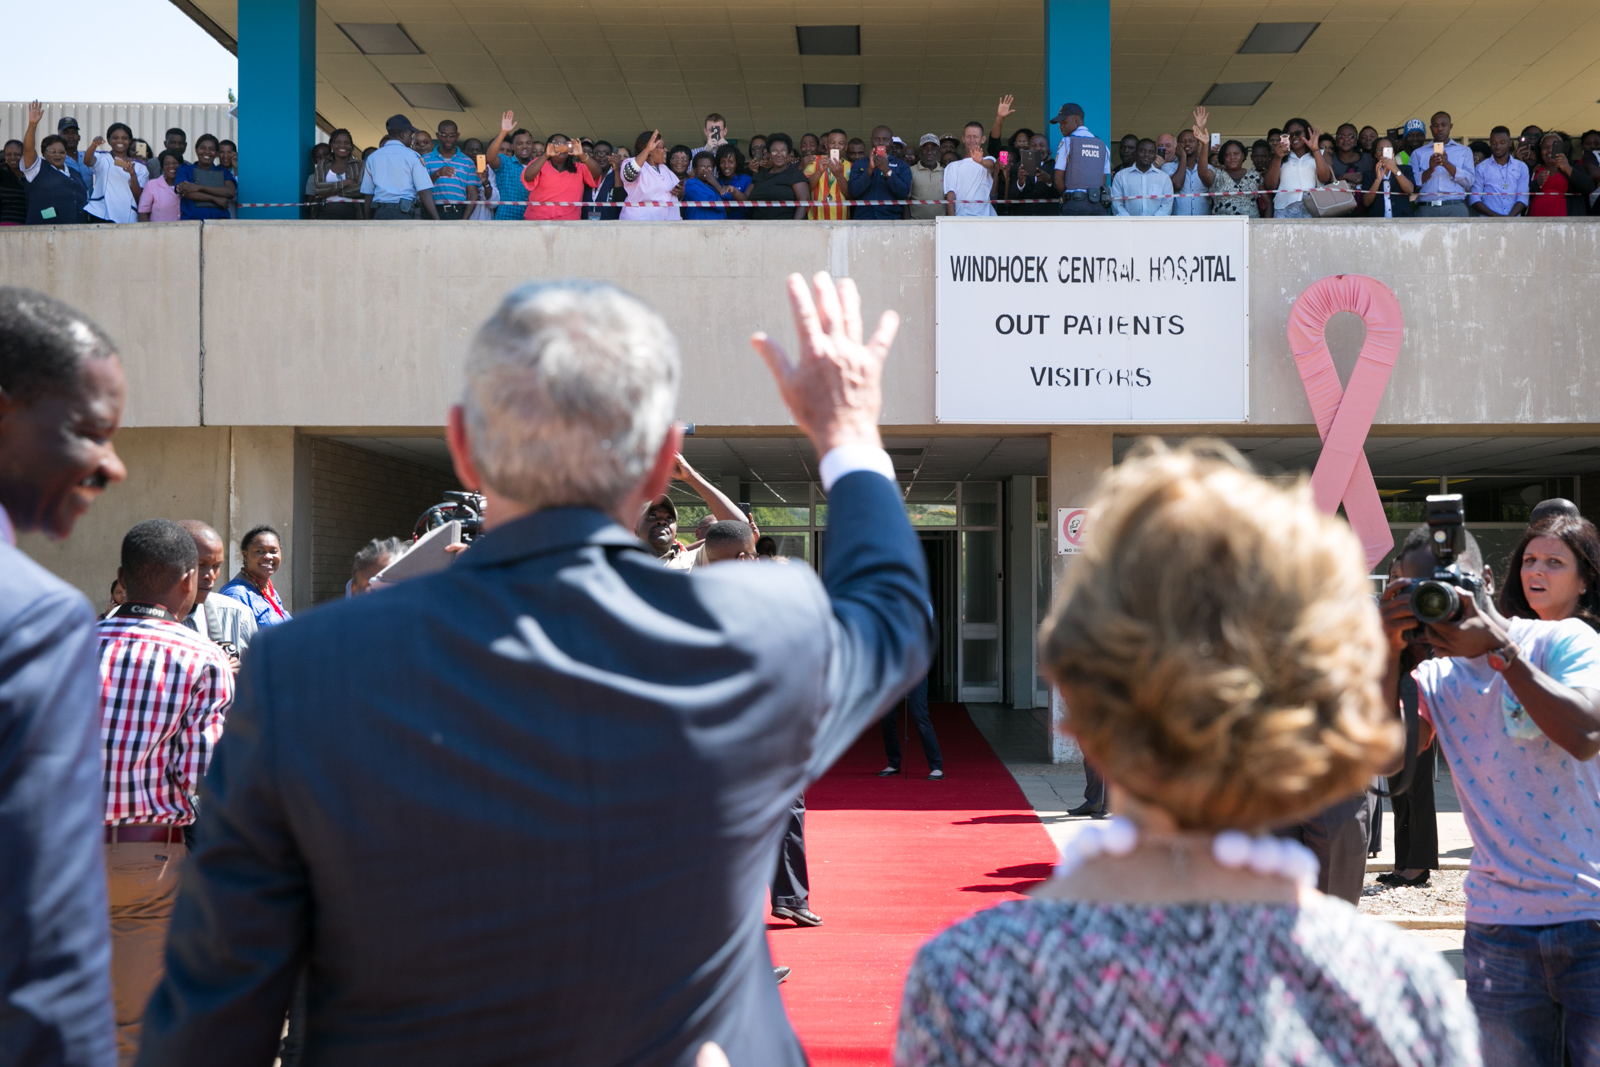 Remarks by President Bush at Windhoek Central Hospital